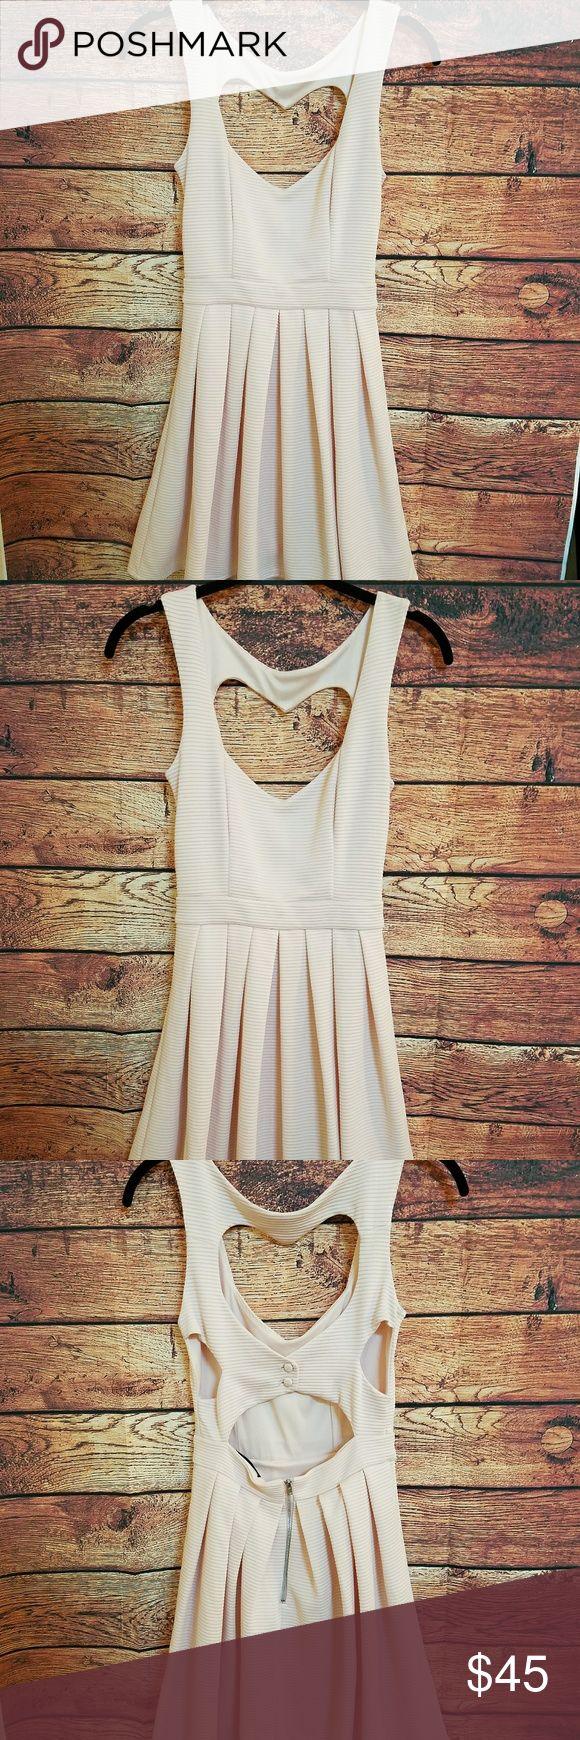 Topshop pink heart back dress size 4 Topshop pink heart back dress size 4 in great condition Topshop Dresses Mini